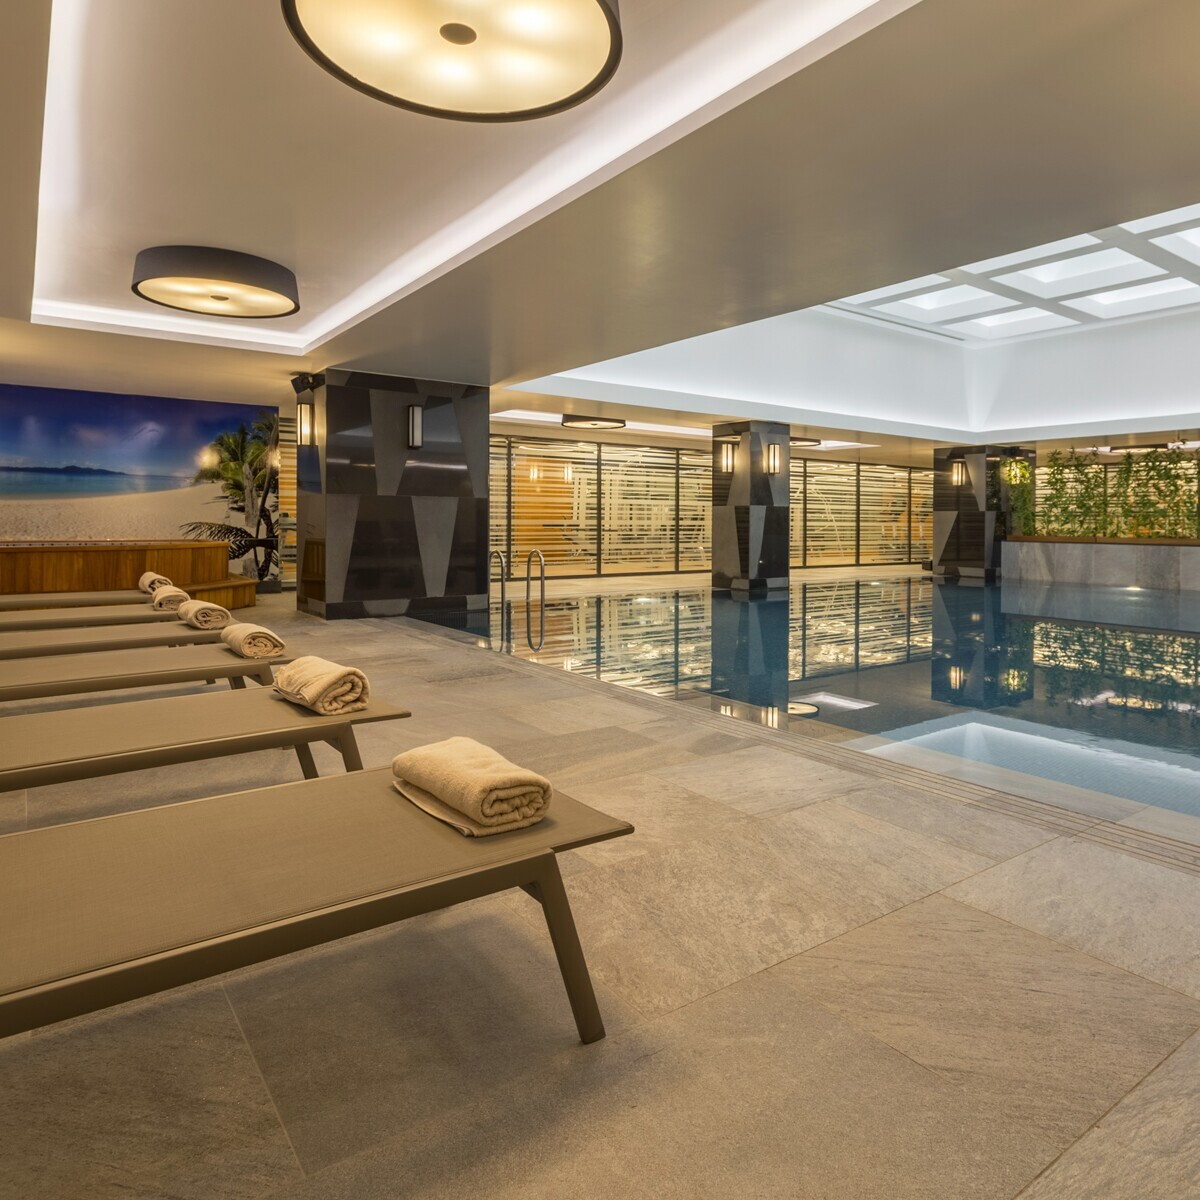 Golden Tulip Bayrampaşa Hotel Spastanbul'da Masaj Seçenekleri